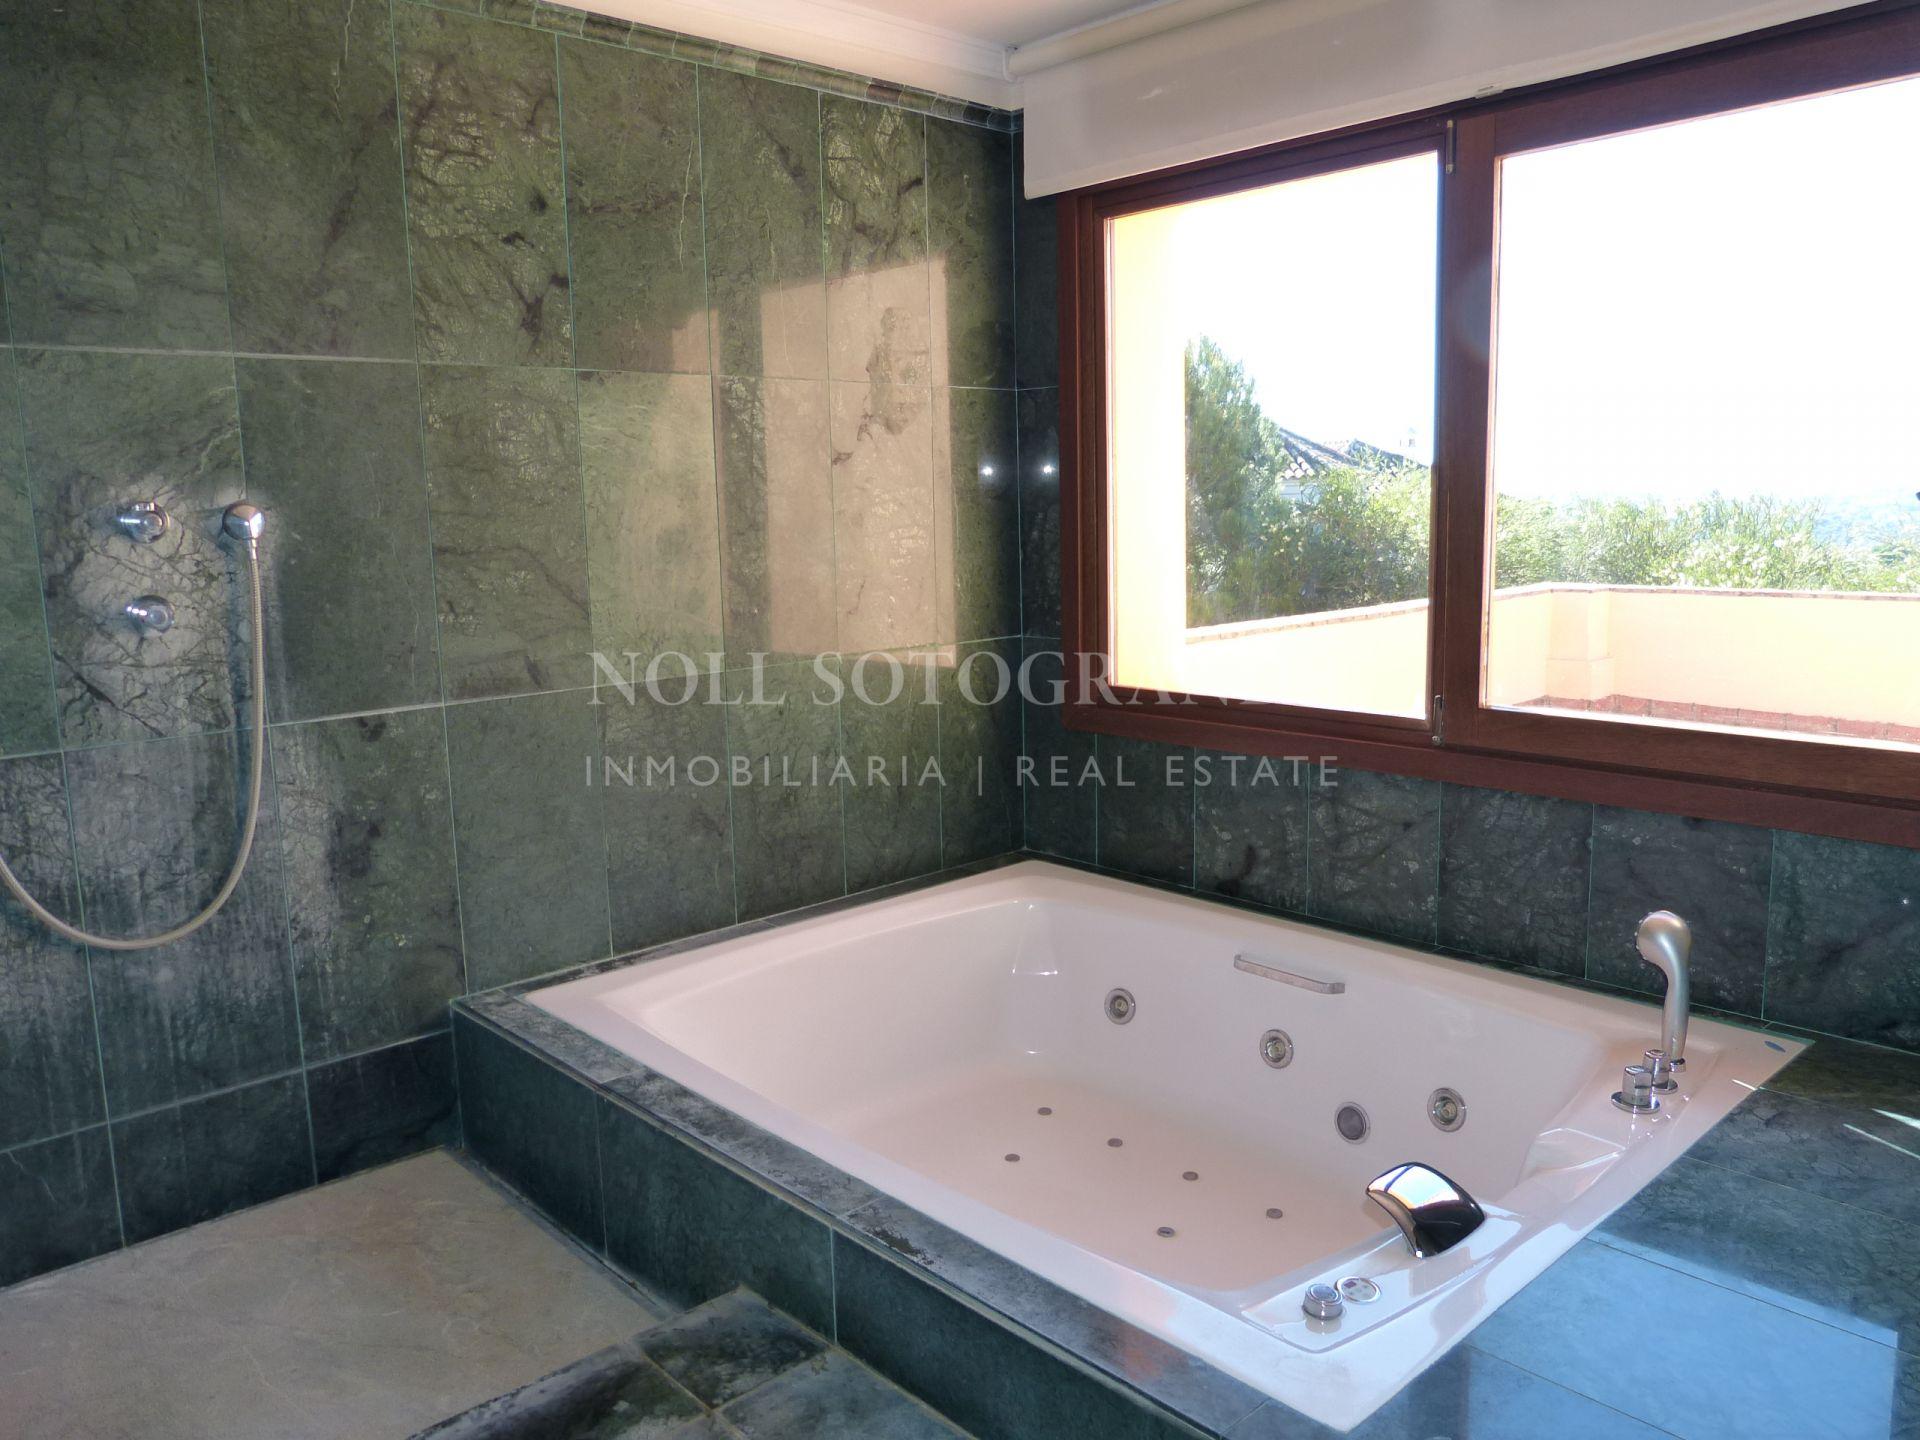 Villa for sale near Sotogrande International School